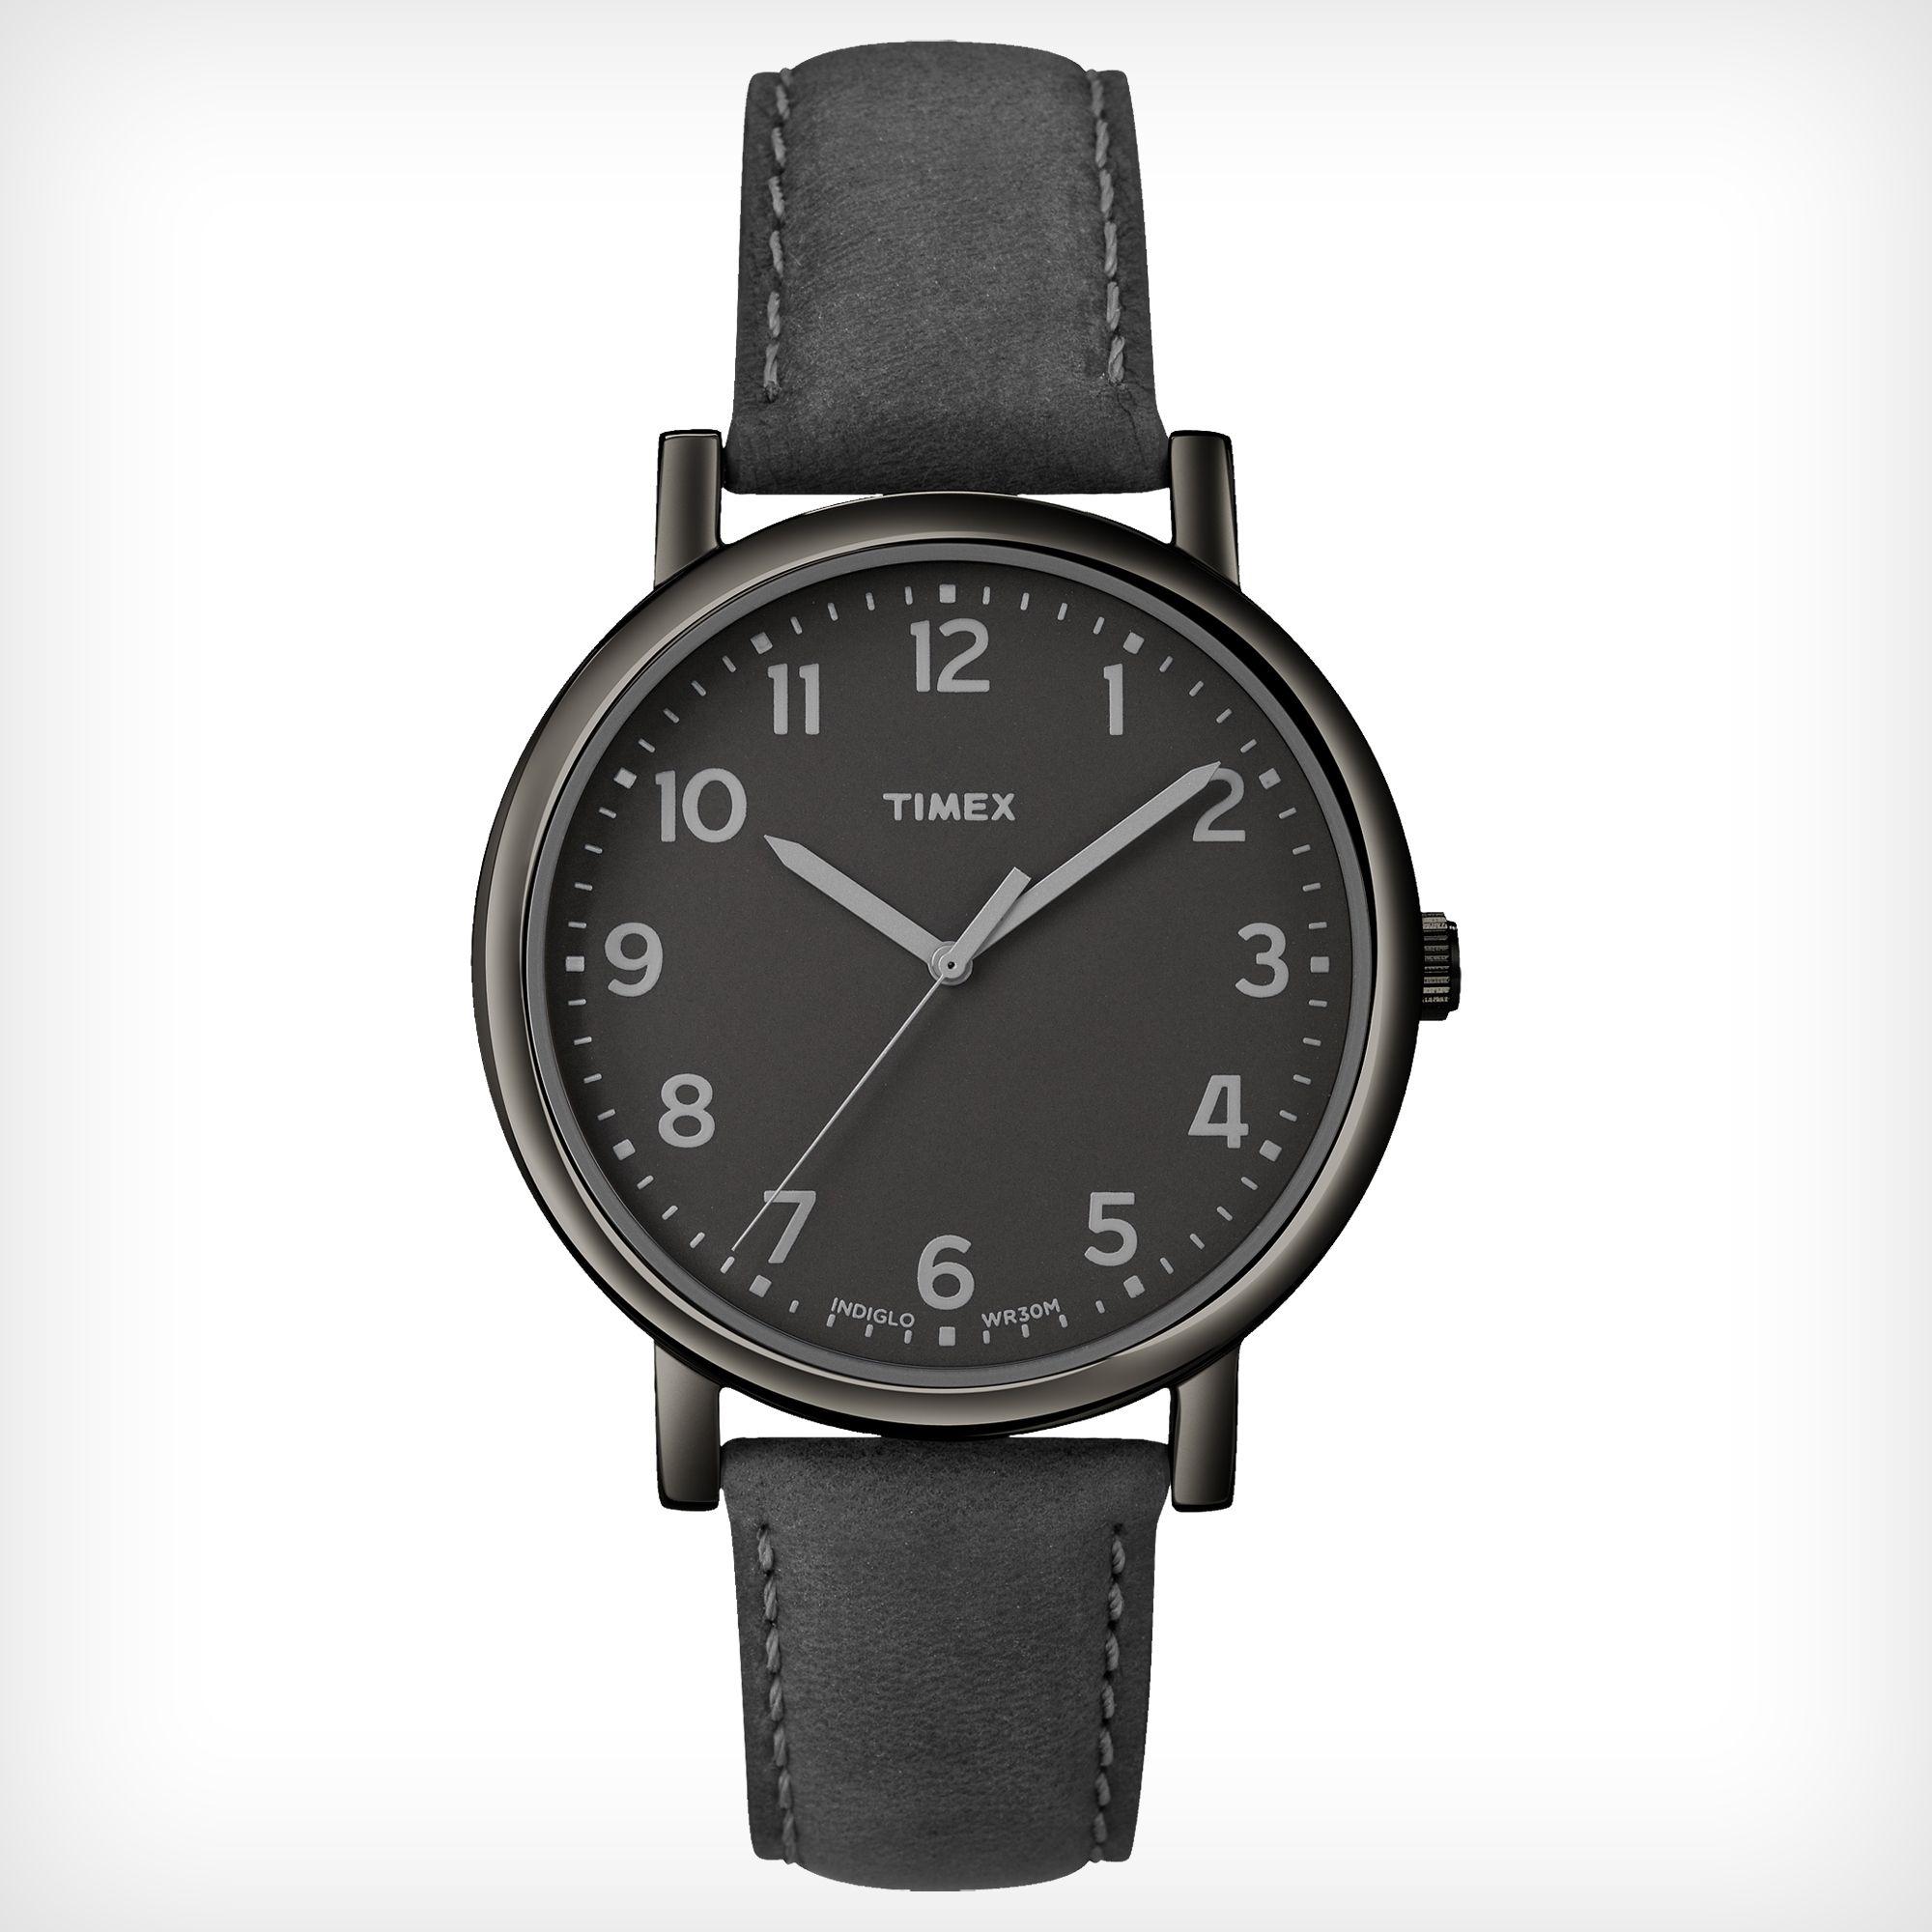 Timex Originals Classic Round | TIMEX / $65